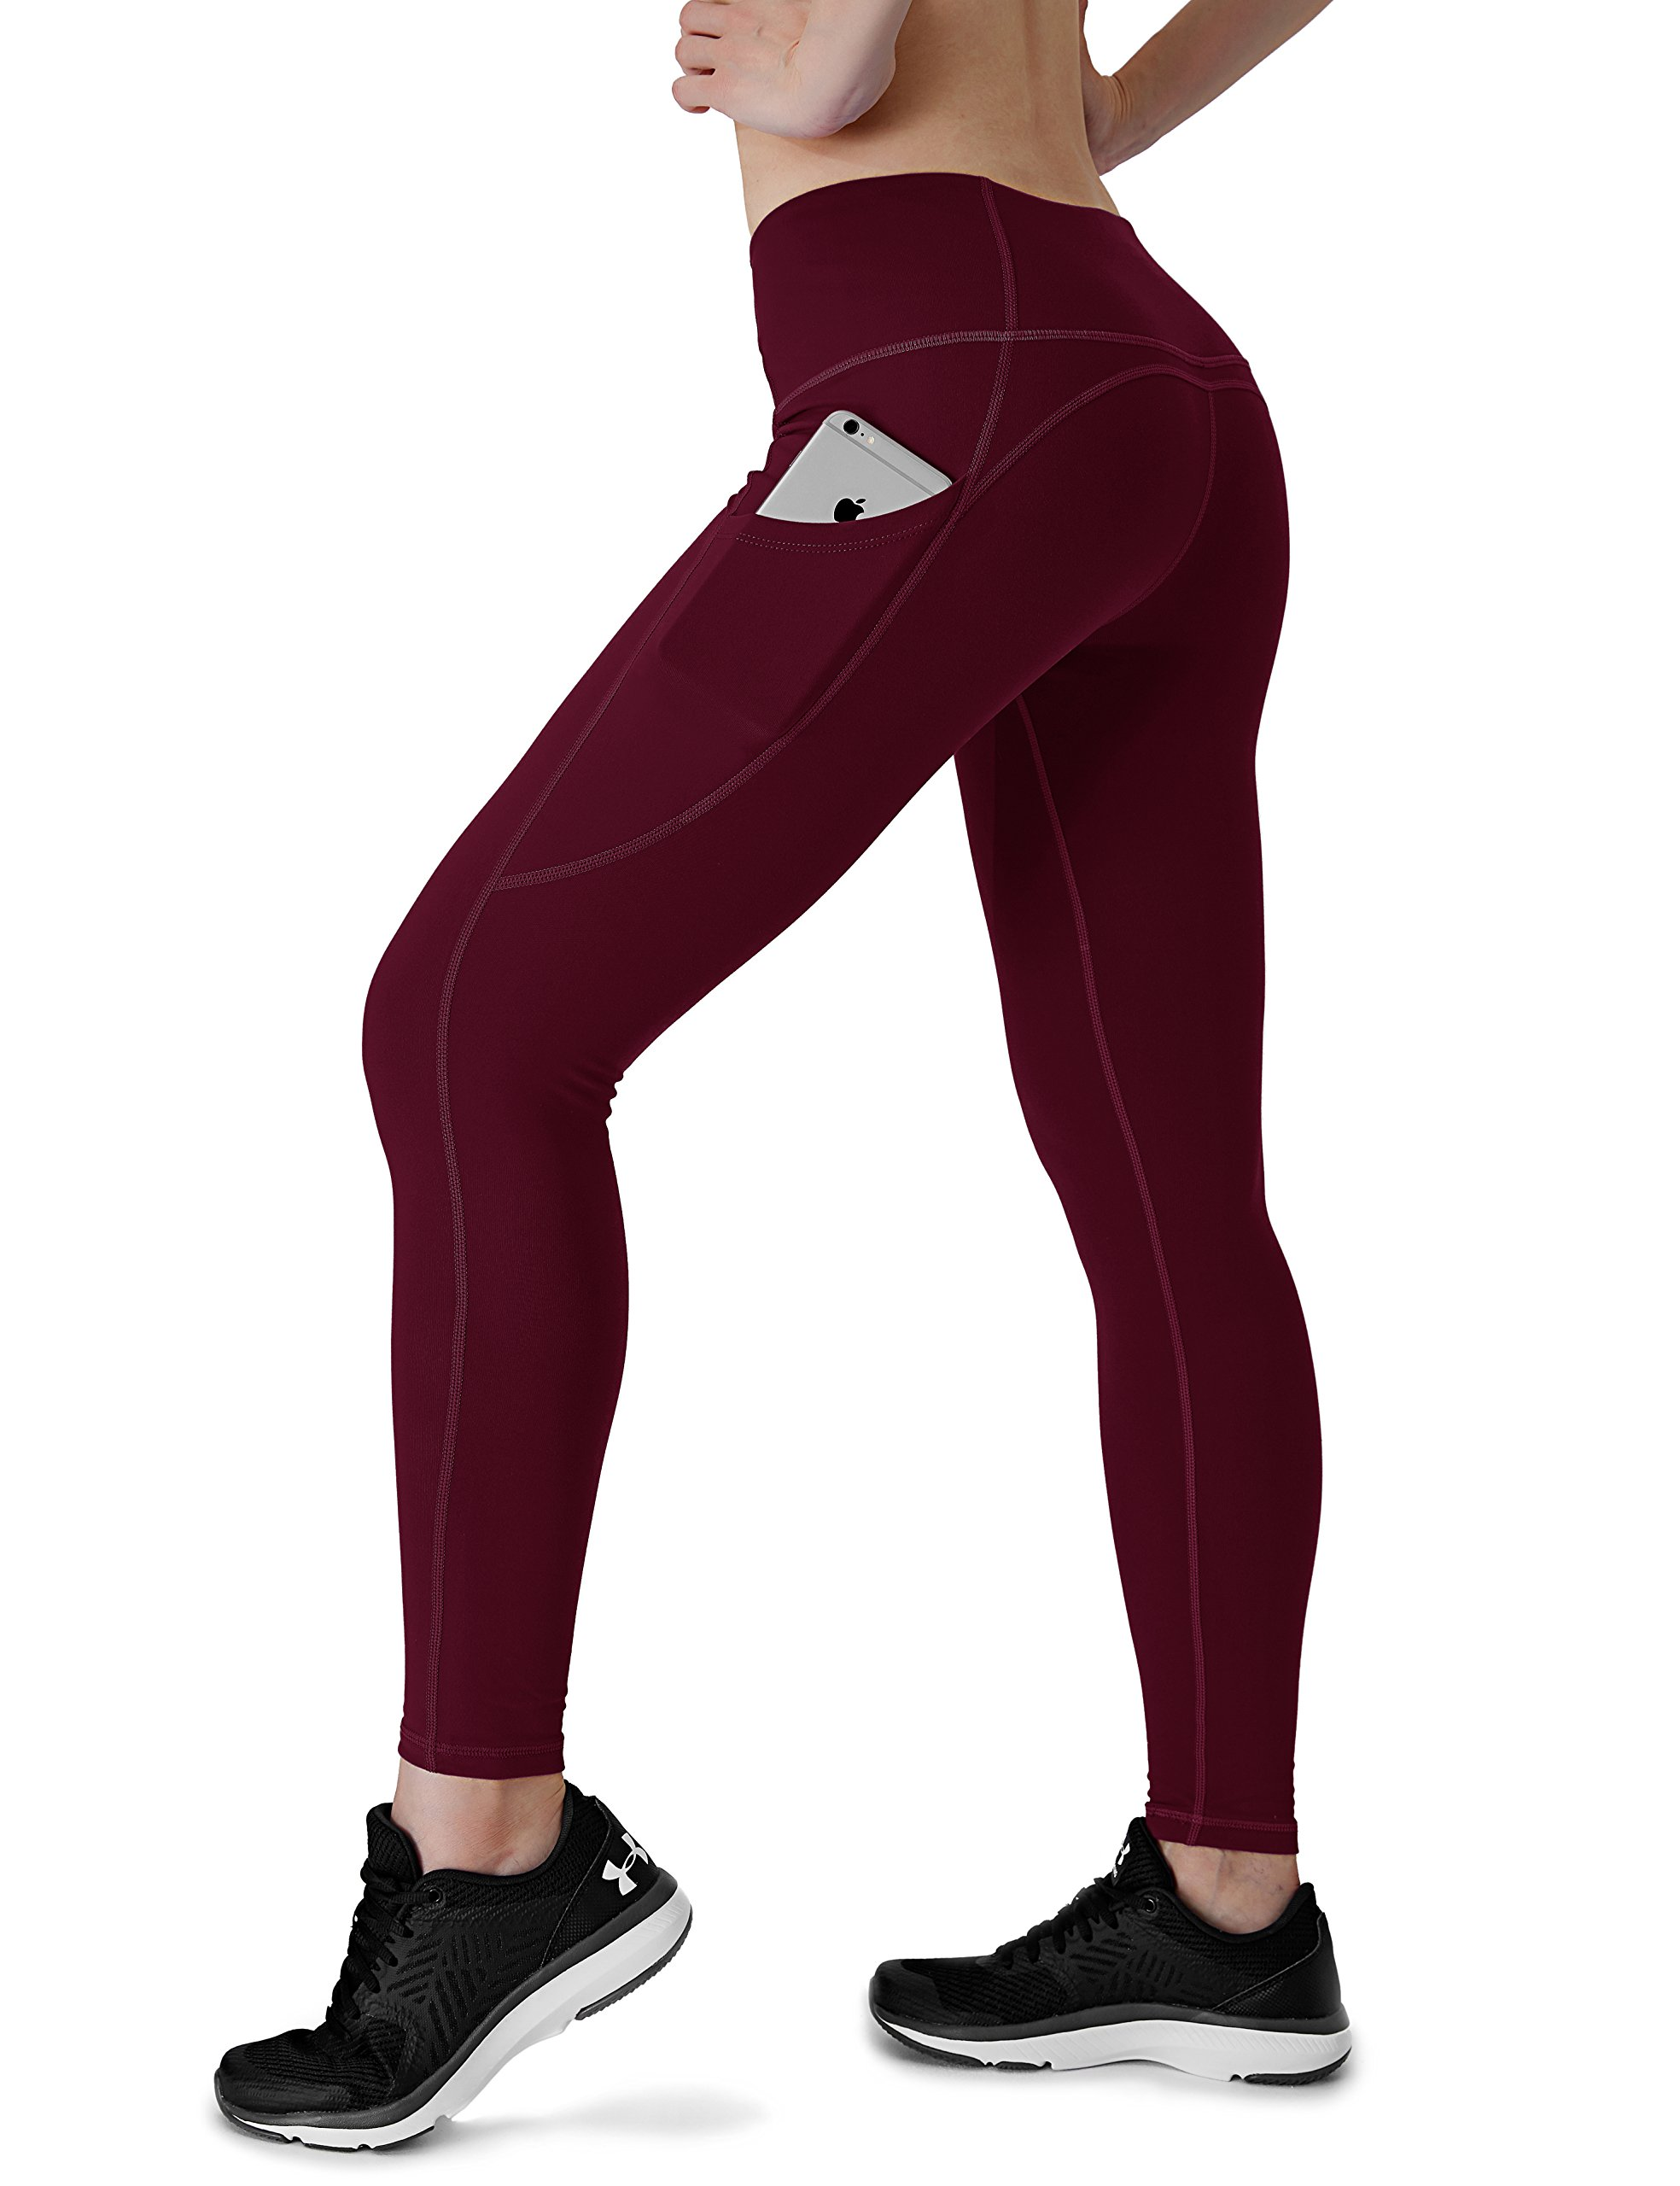 Dyorigin Leggings for Women – High-Waisted Tummy Control Compression Yoga Leggings Athletic Pants with Pockets (So Merlot, XS)